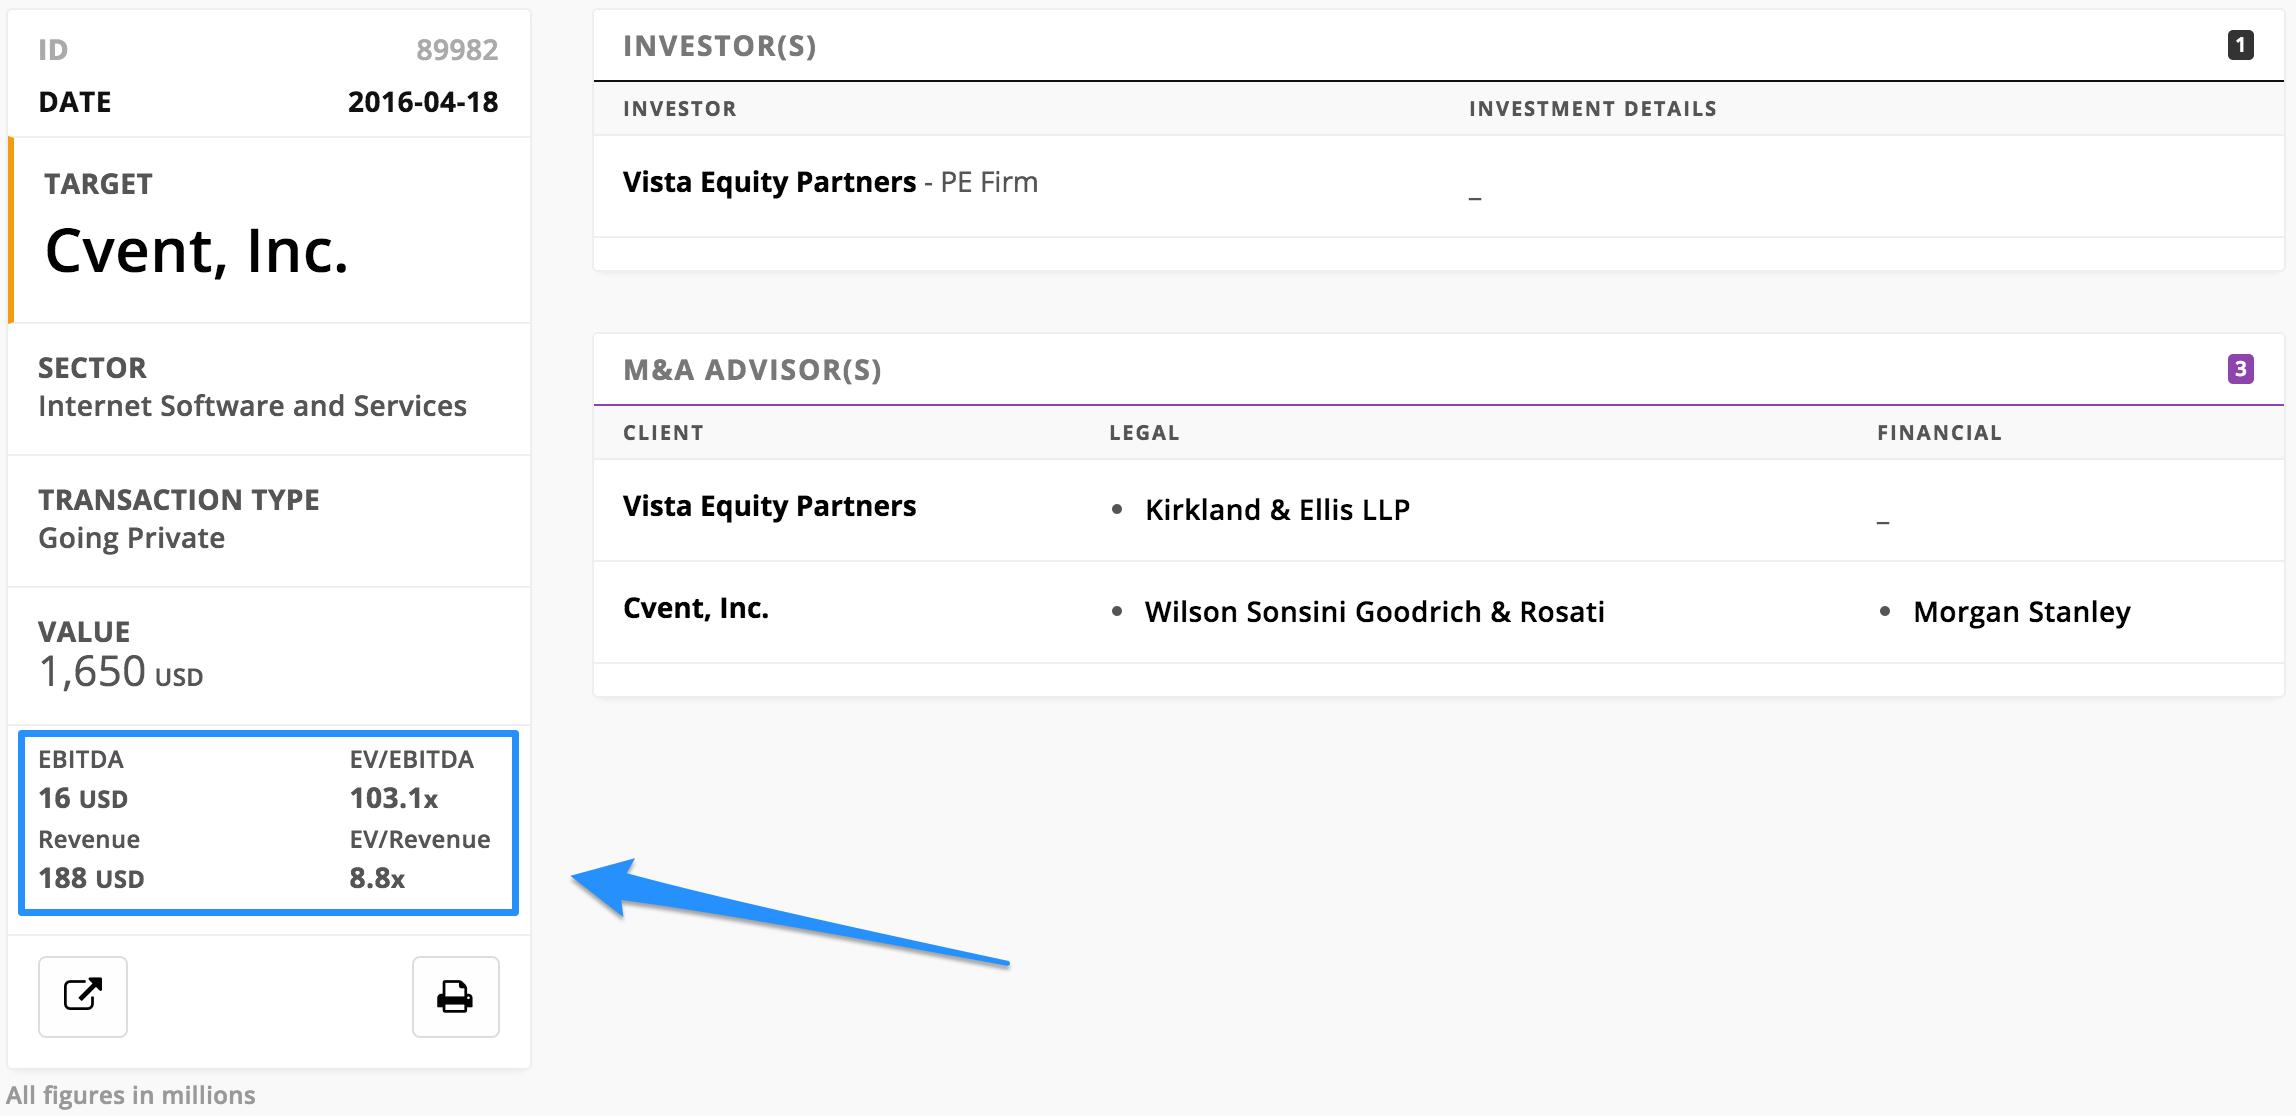 Revenue / EBITDA Valuation Multiple